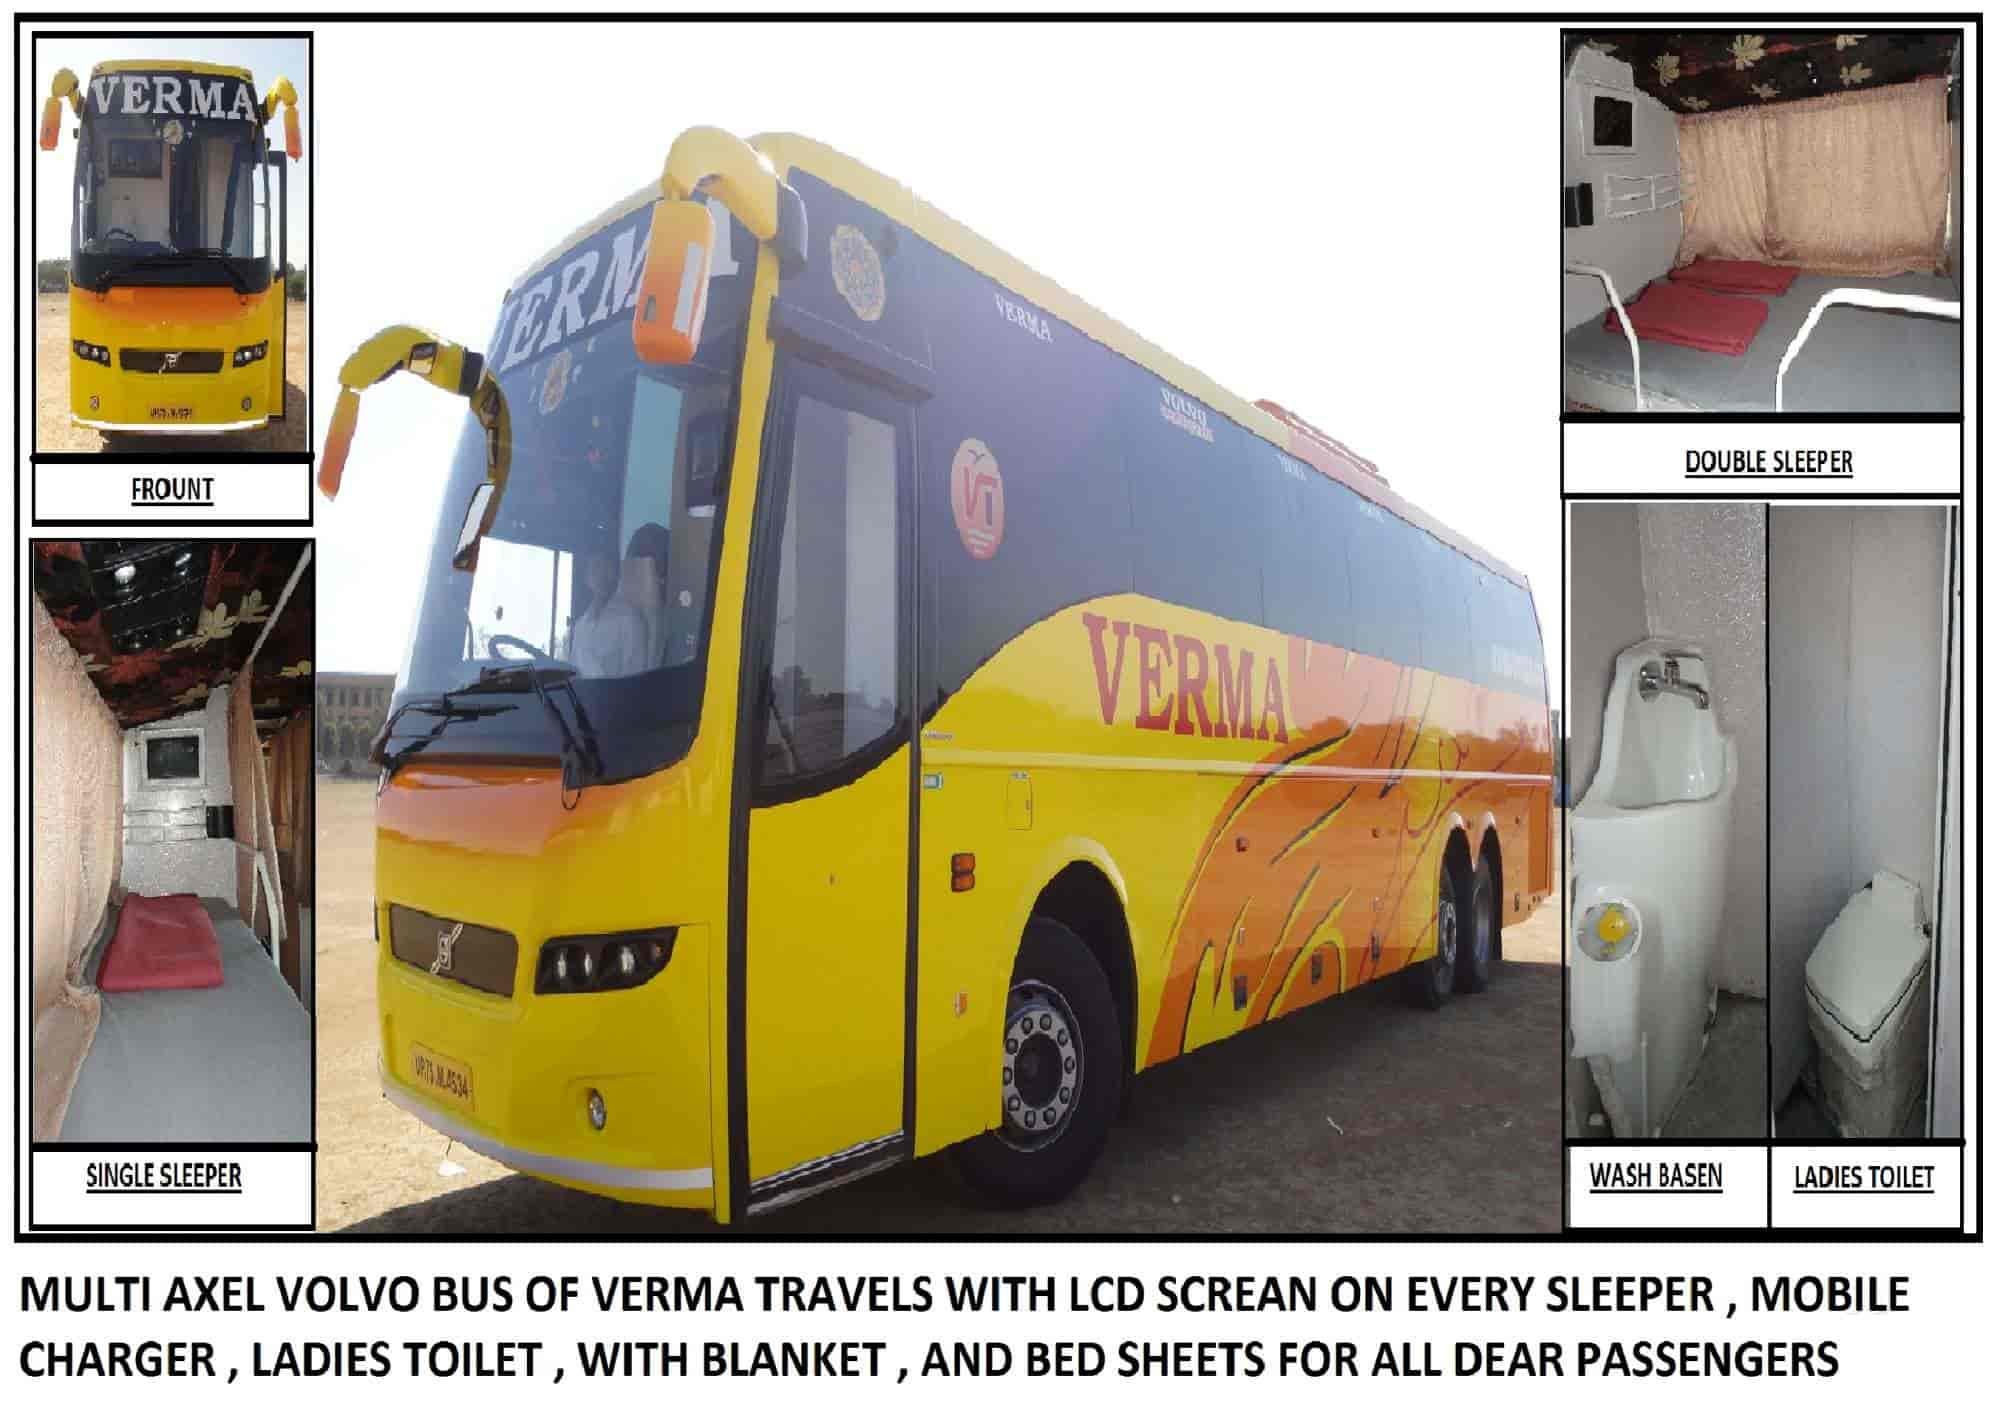 Verma Travels Bhopal Office No | lifehacked1st.com